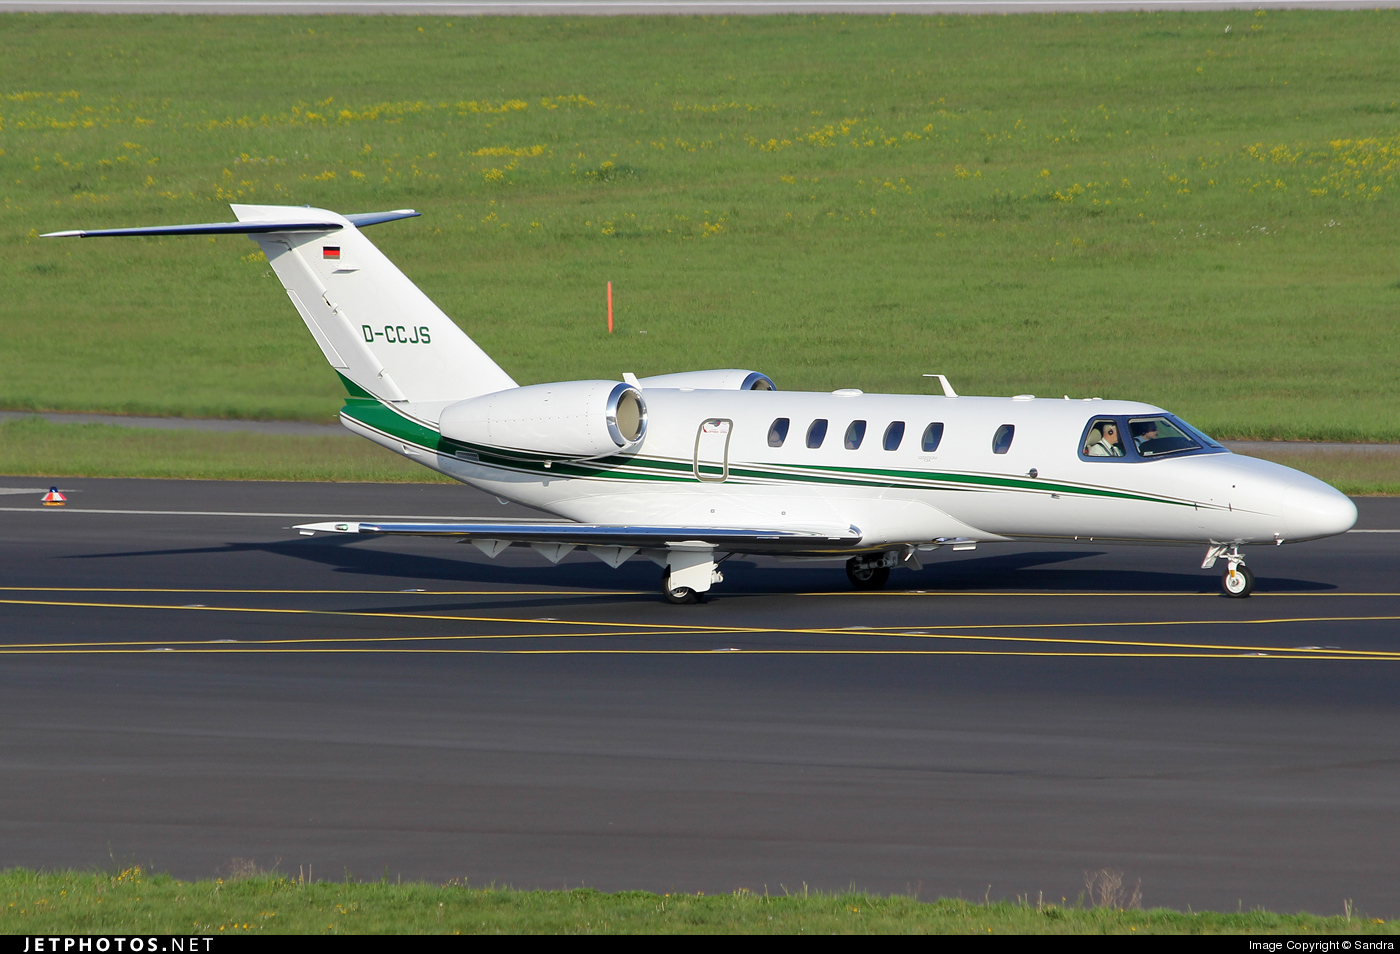 D Ccjs Cessna 525c Citation Cj4 Private Sandra Jetphotos